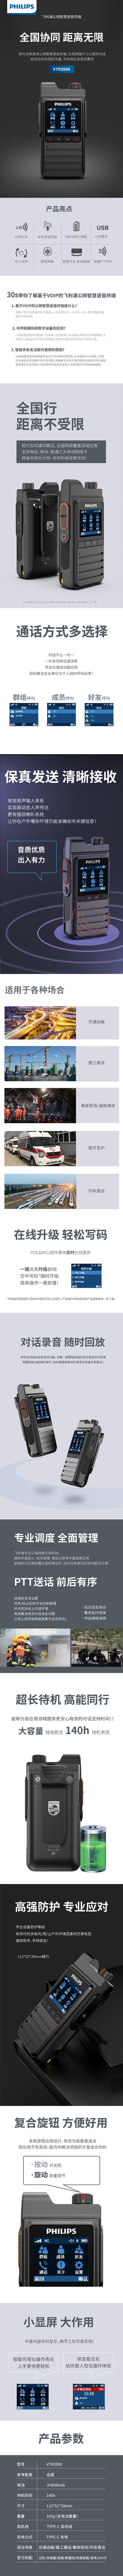 VTR2000_WEB_W750px_V2.1.jpg